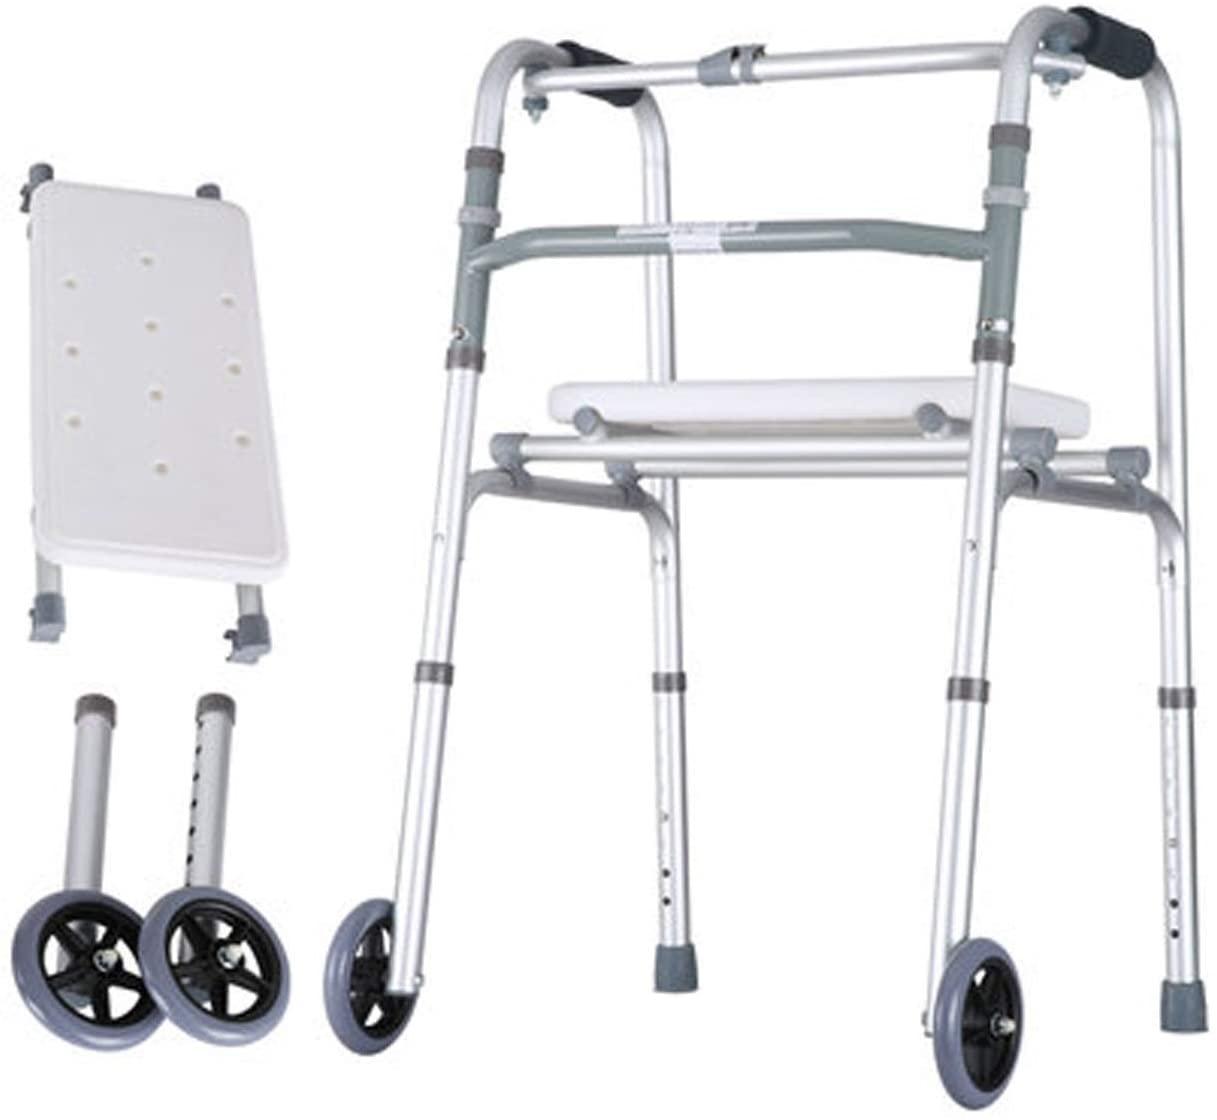 HTLLT Walking Aid Medical Instruments Aluminum Alloy Walking Walker, Carrying 2-Wheel Seat Foldable Auxiliary Walker,D